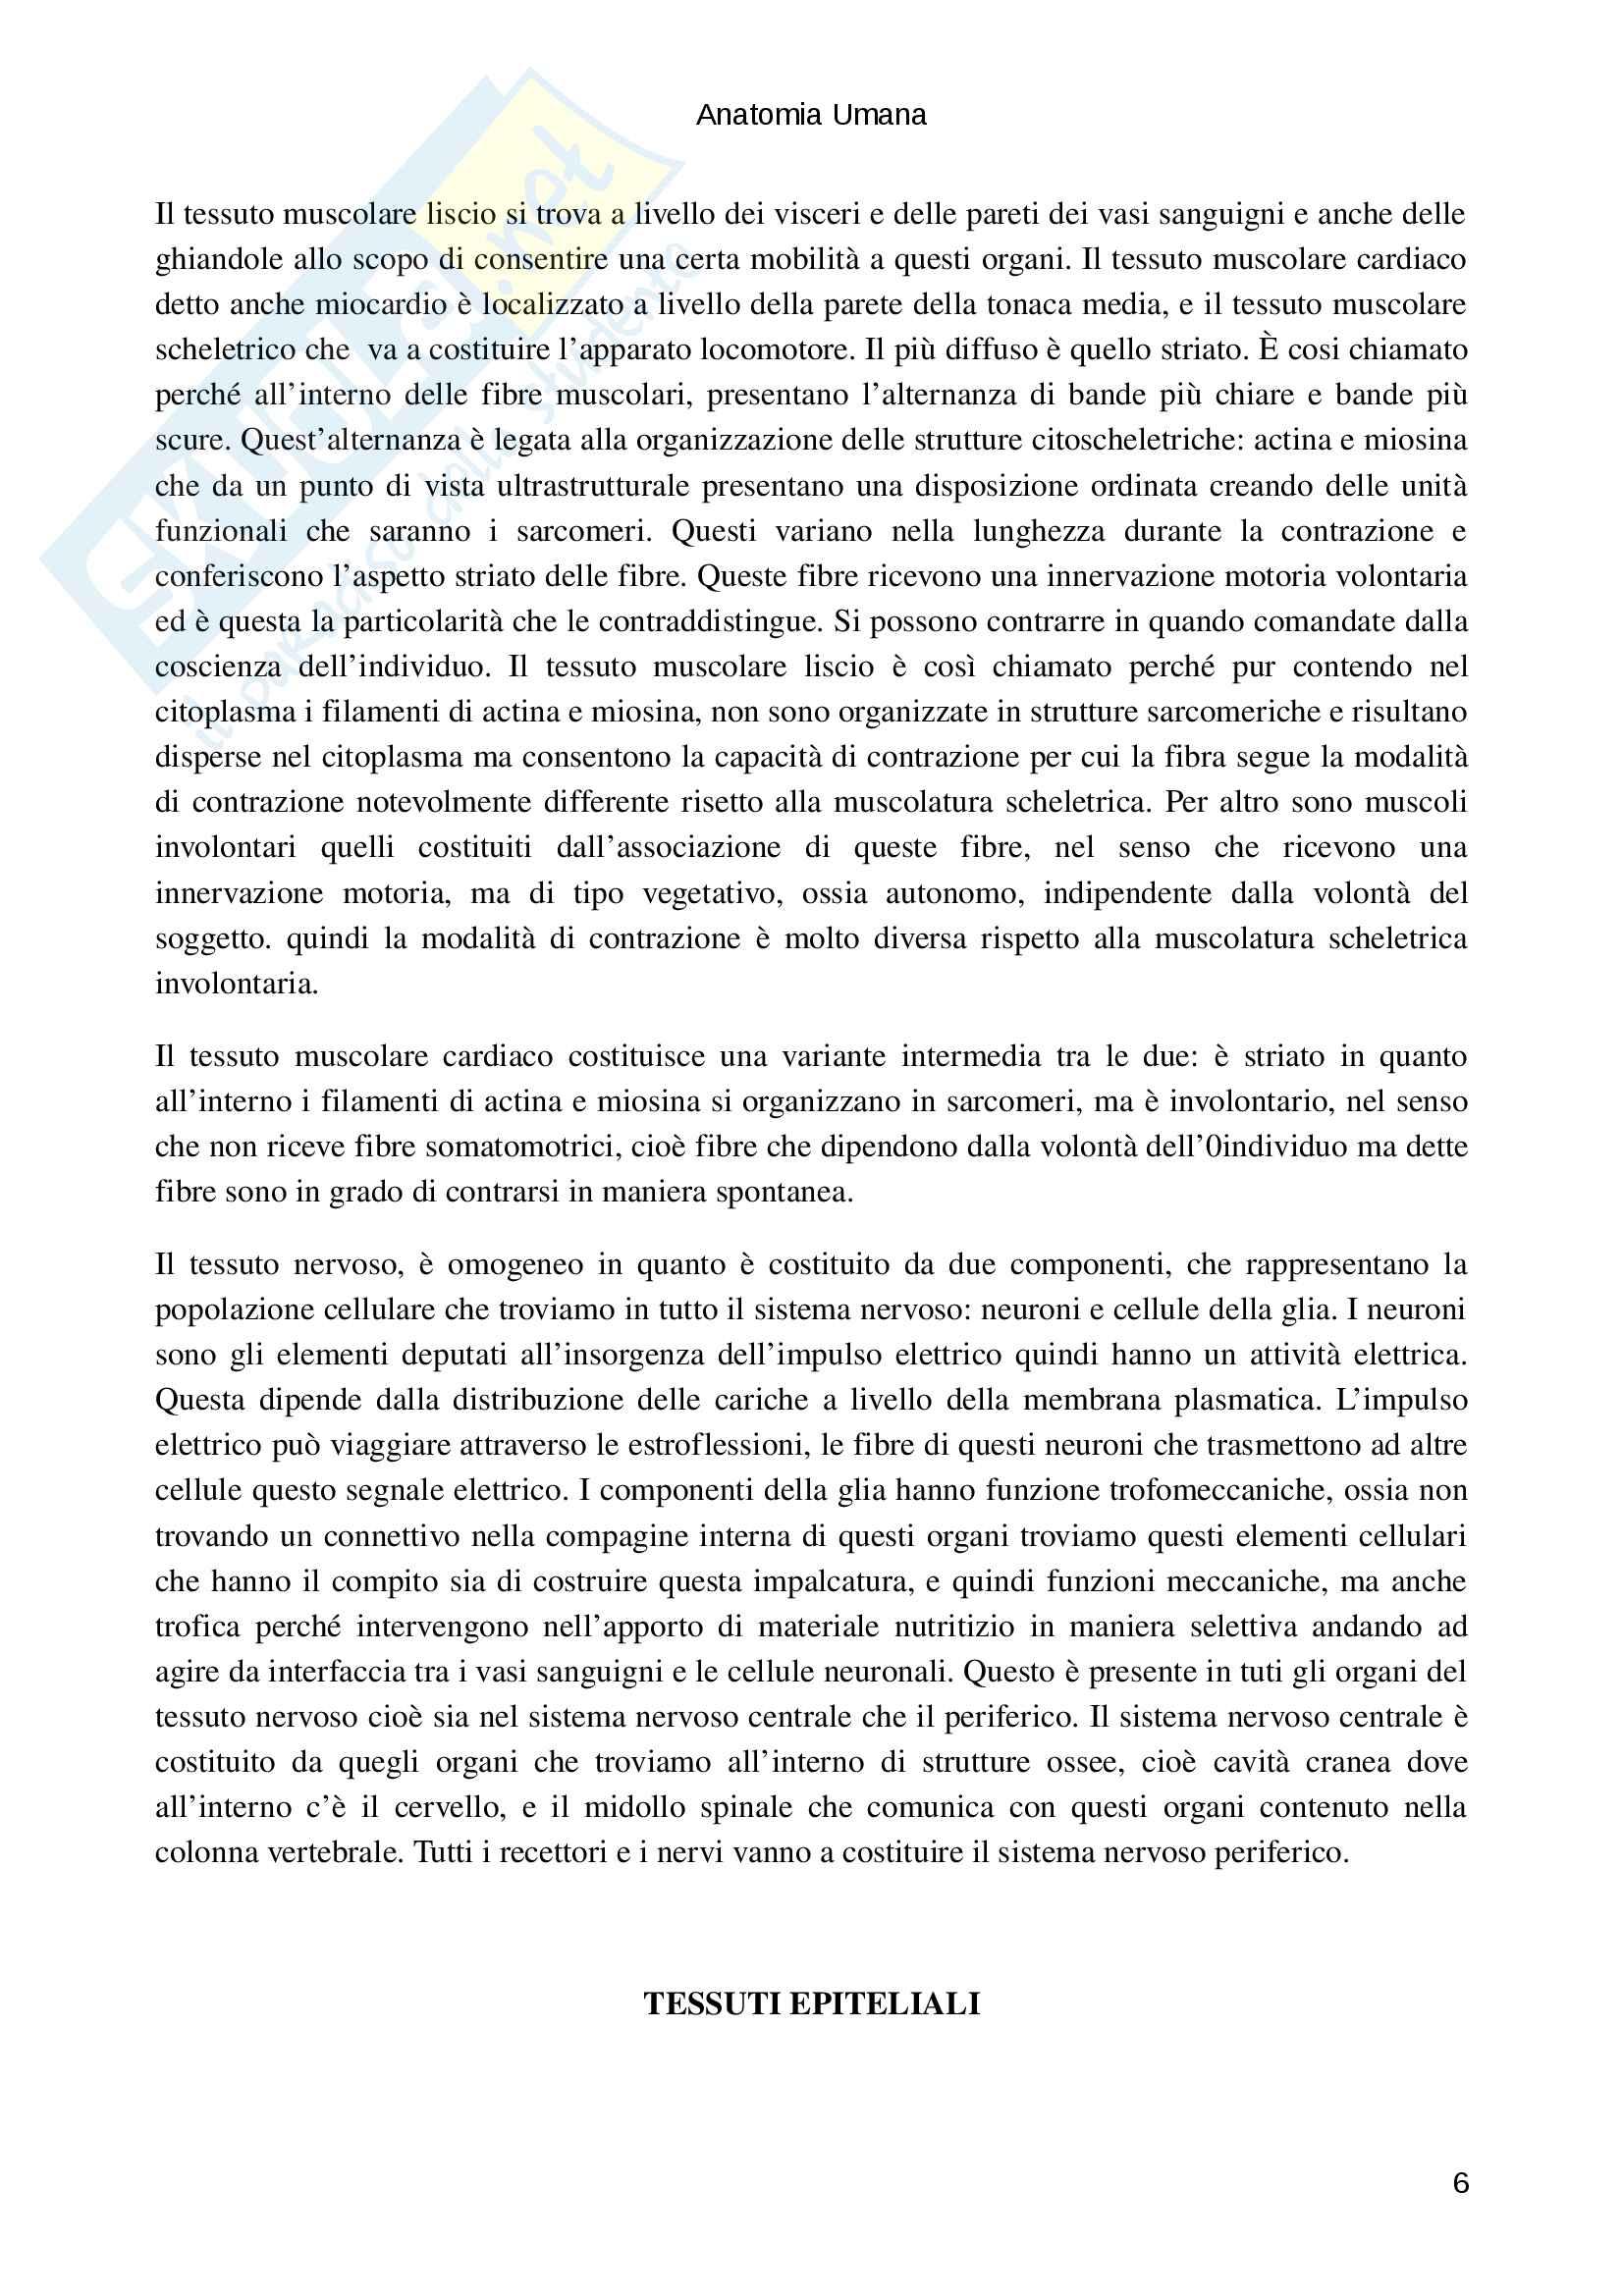 Tessuti epiteliali e connettivi Pag. 6